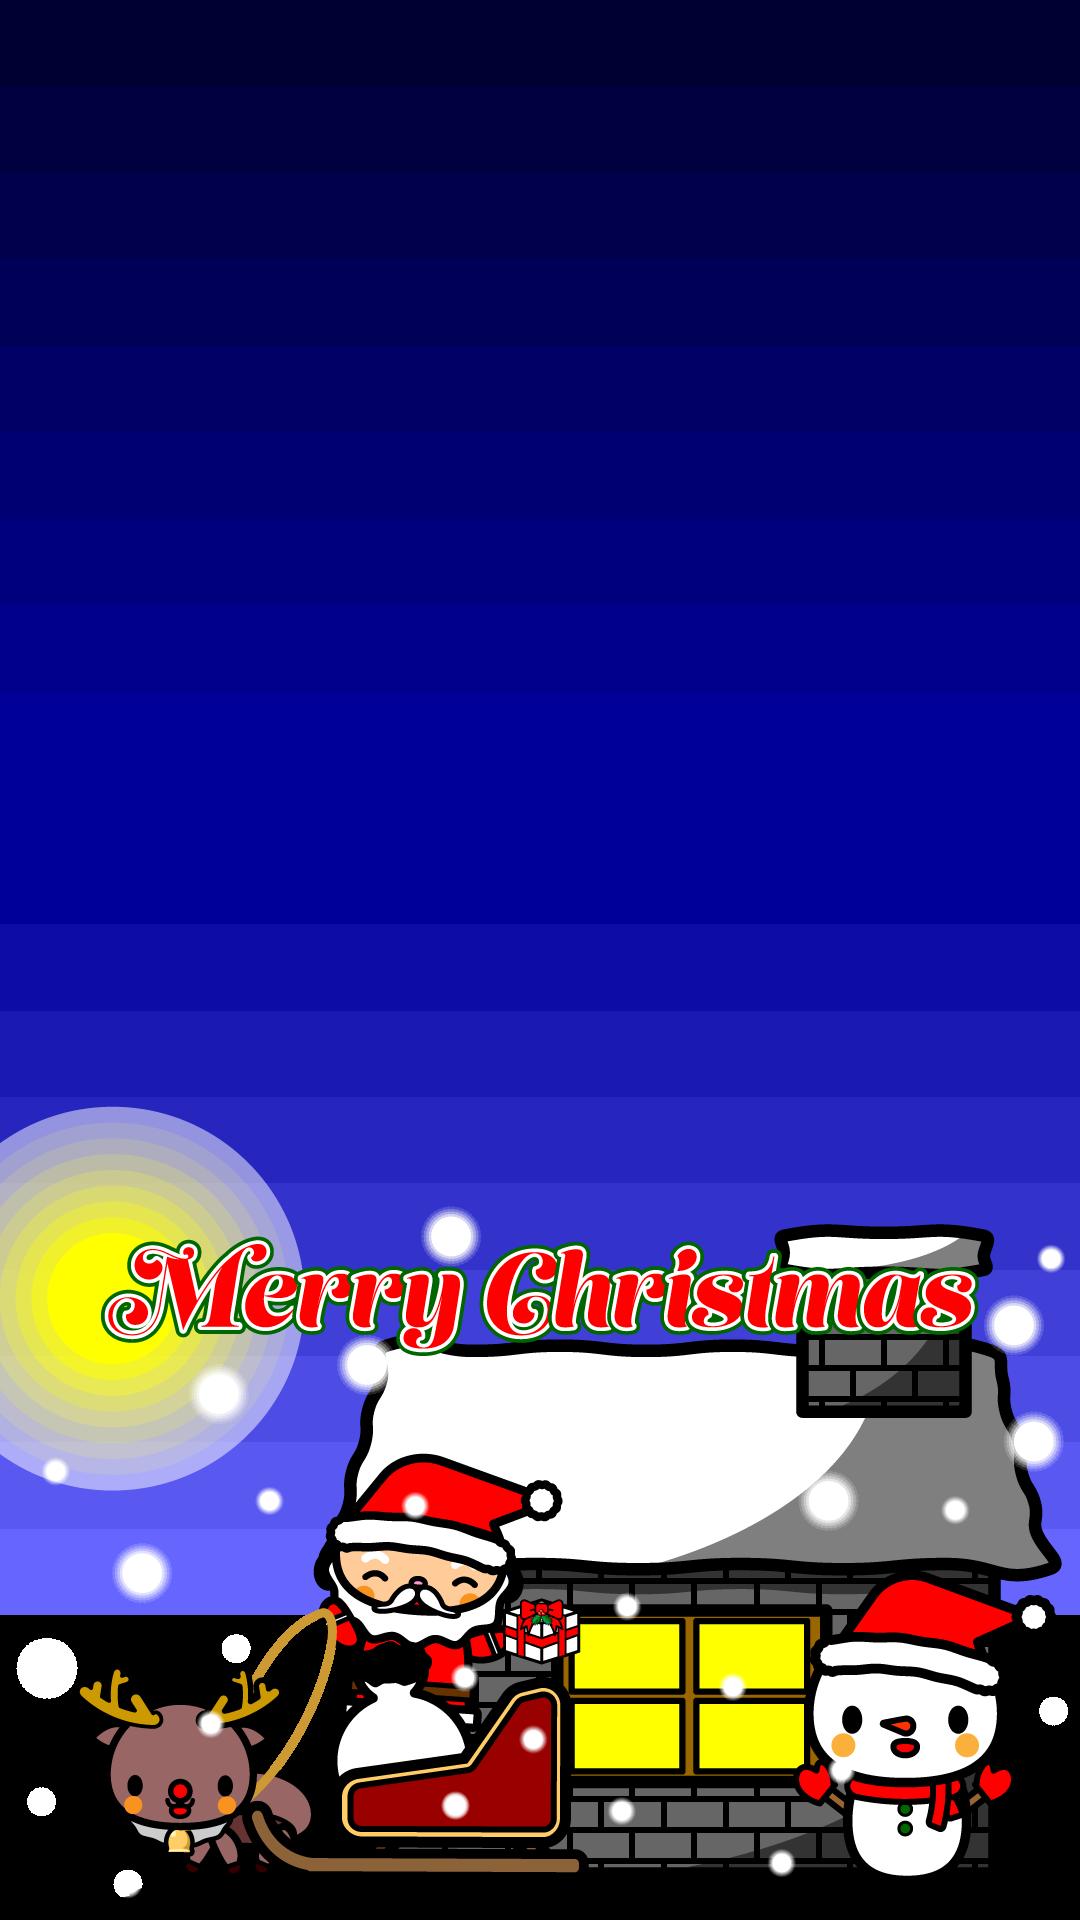 wallpaper6_christmas02-iphone